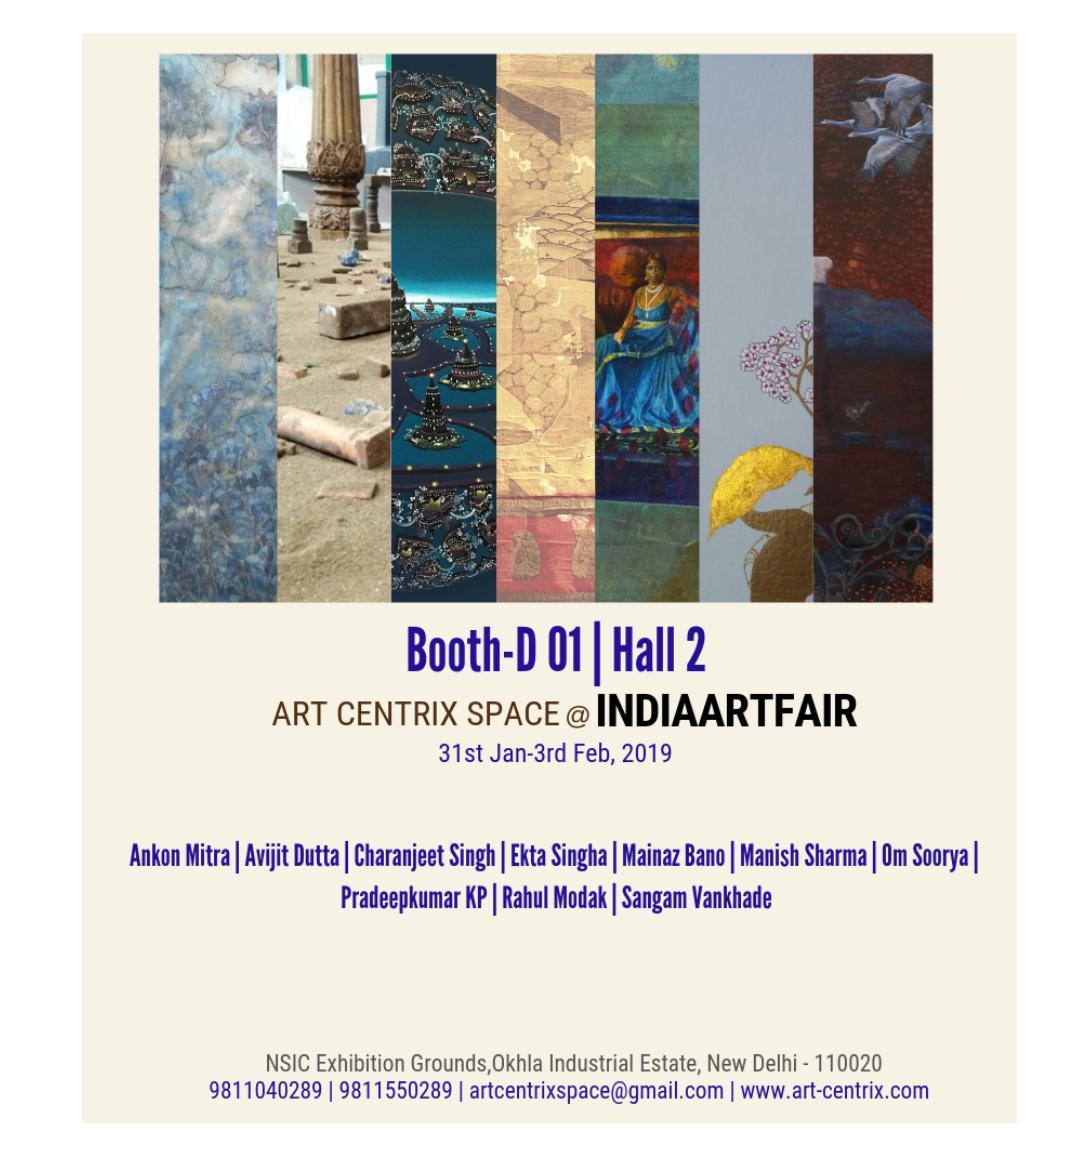 Art Centrix Space @ India Art Fair 2019